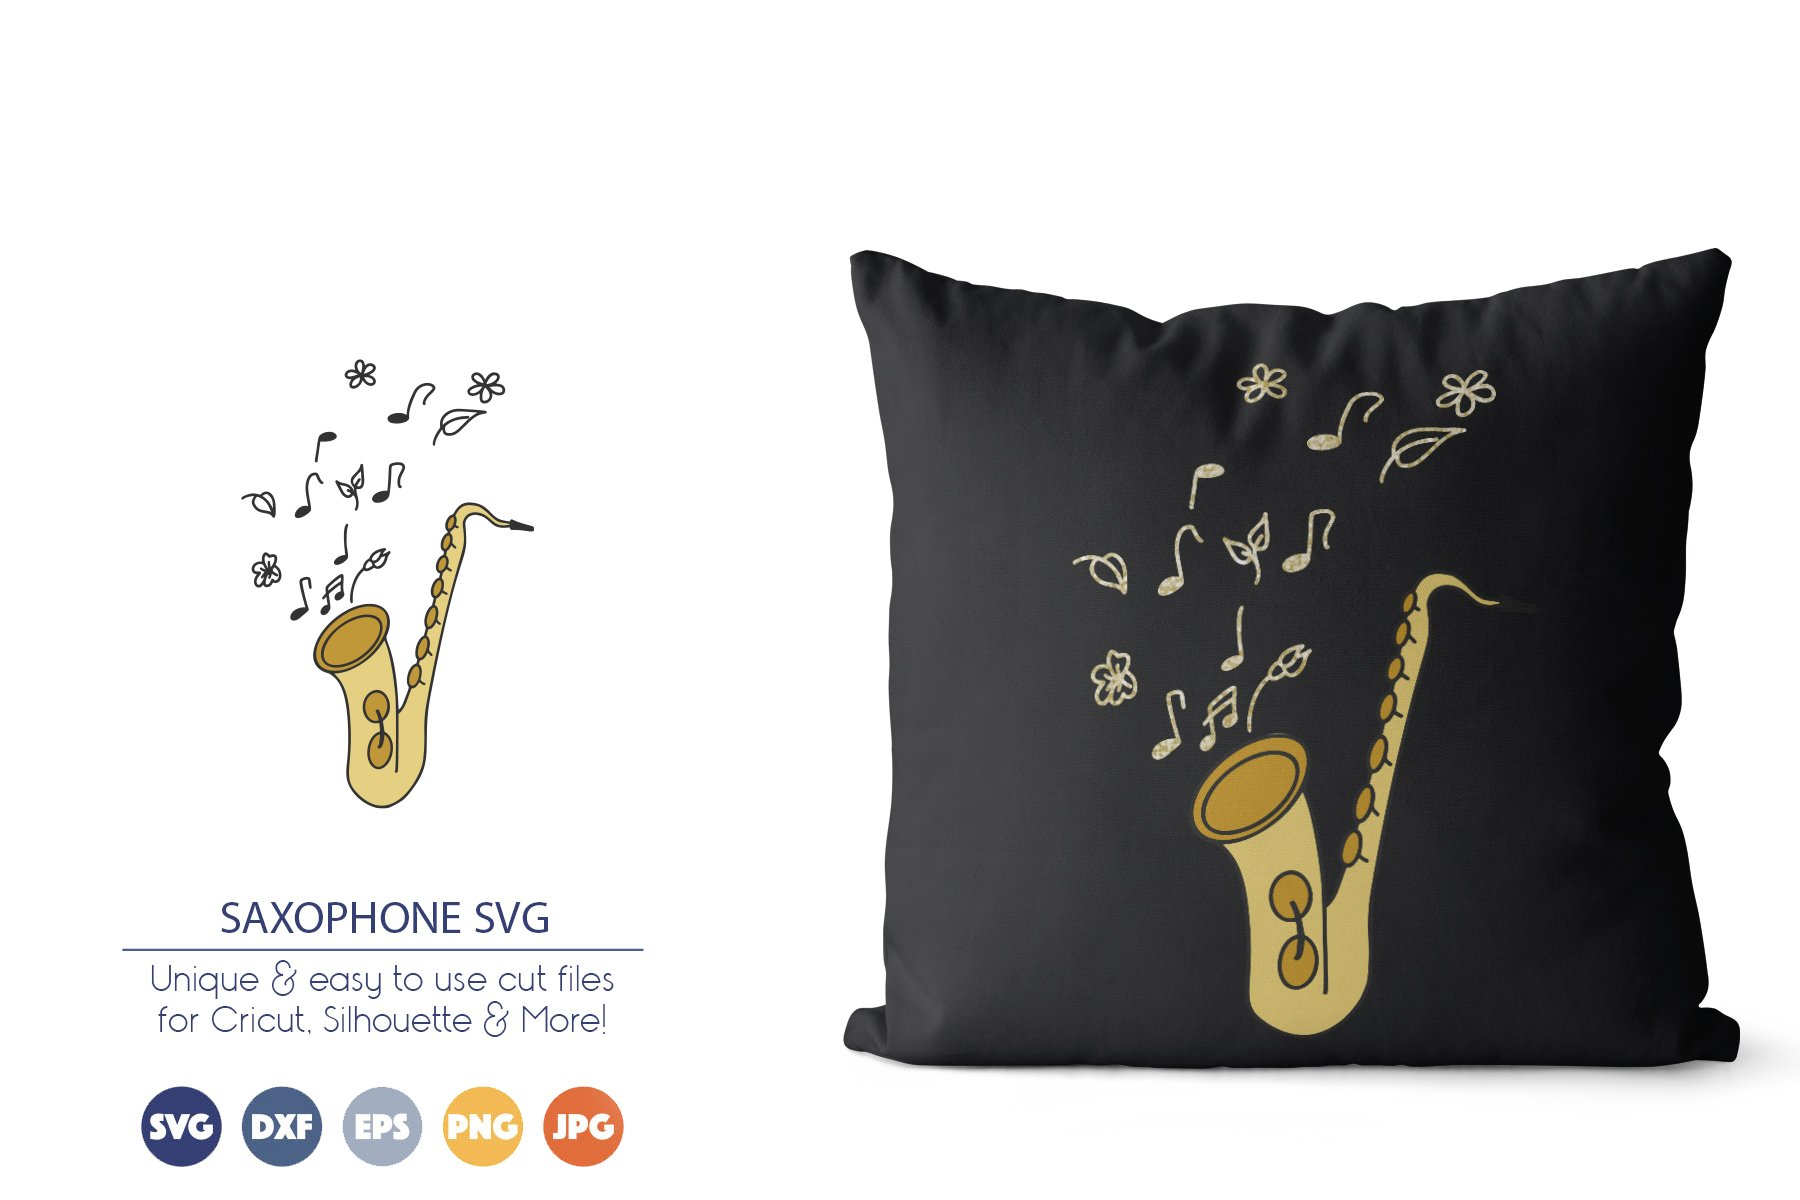 Saxophone SVG | Jazz Music SVG example image 1